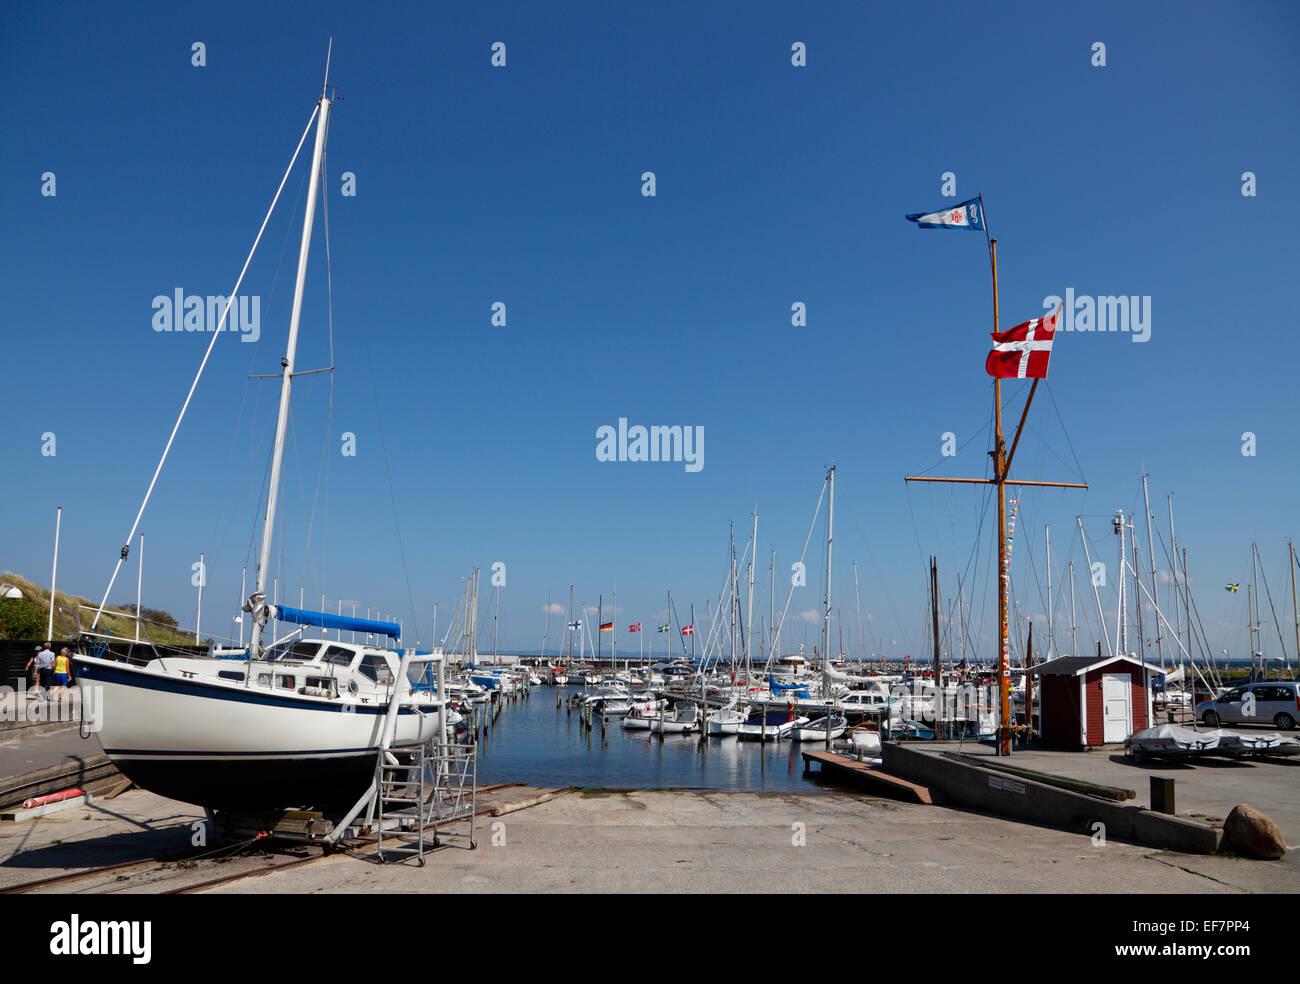 Hornbæk / Hornbaek Harbour, North Zealand, Denmark, on a warm and sunny summer day. A sailing boat still on - Stock Image